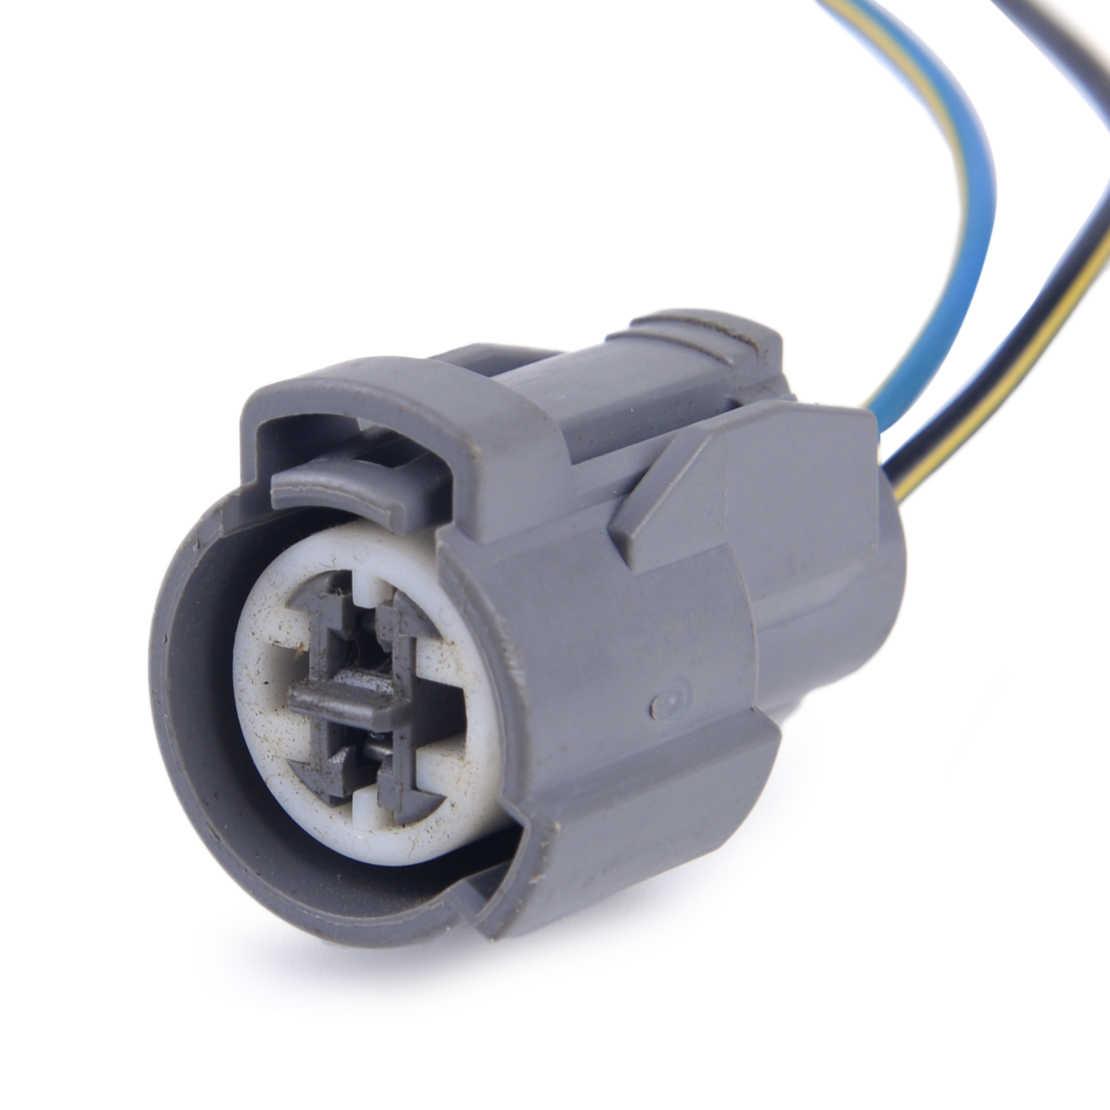 DWCX IAT Intake Air Temperature Fan Knock Coolant Temp Sensor Connector  Plug Pigtail Fit for Honda Civic B D H F Engines